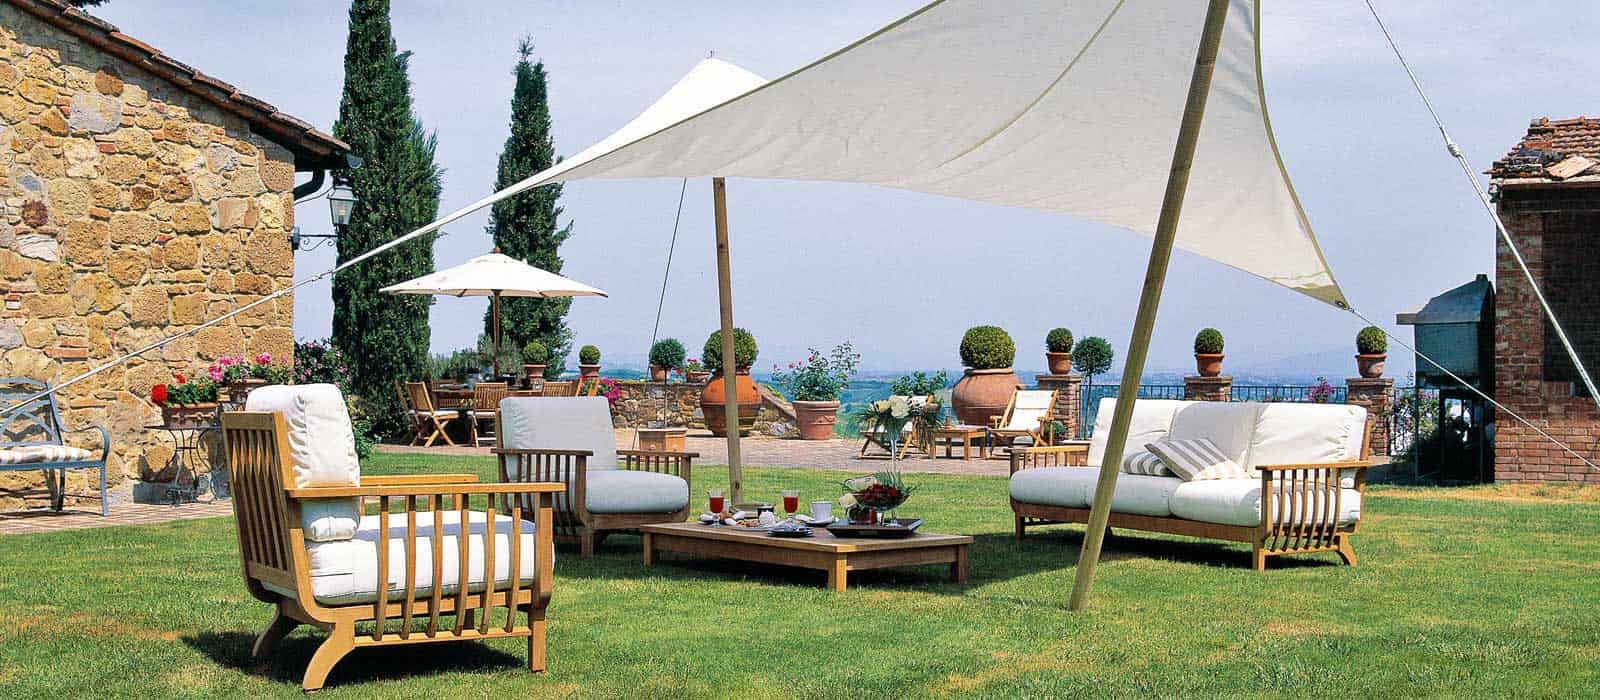 Gida arredamenti great cabine doccia with gida for Arredo giardino treviso